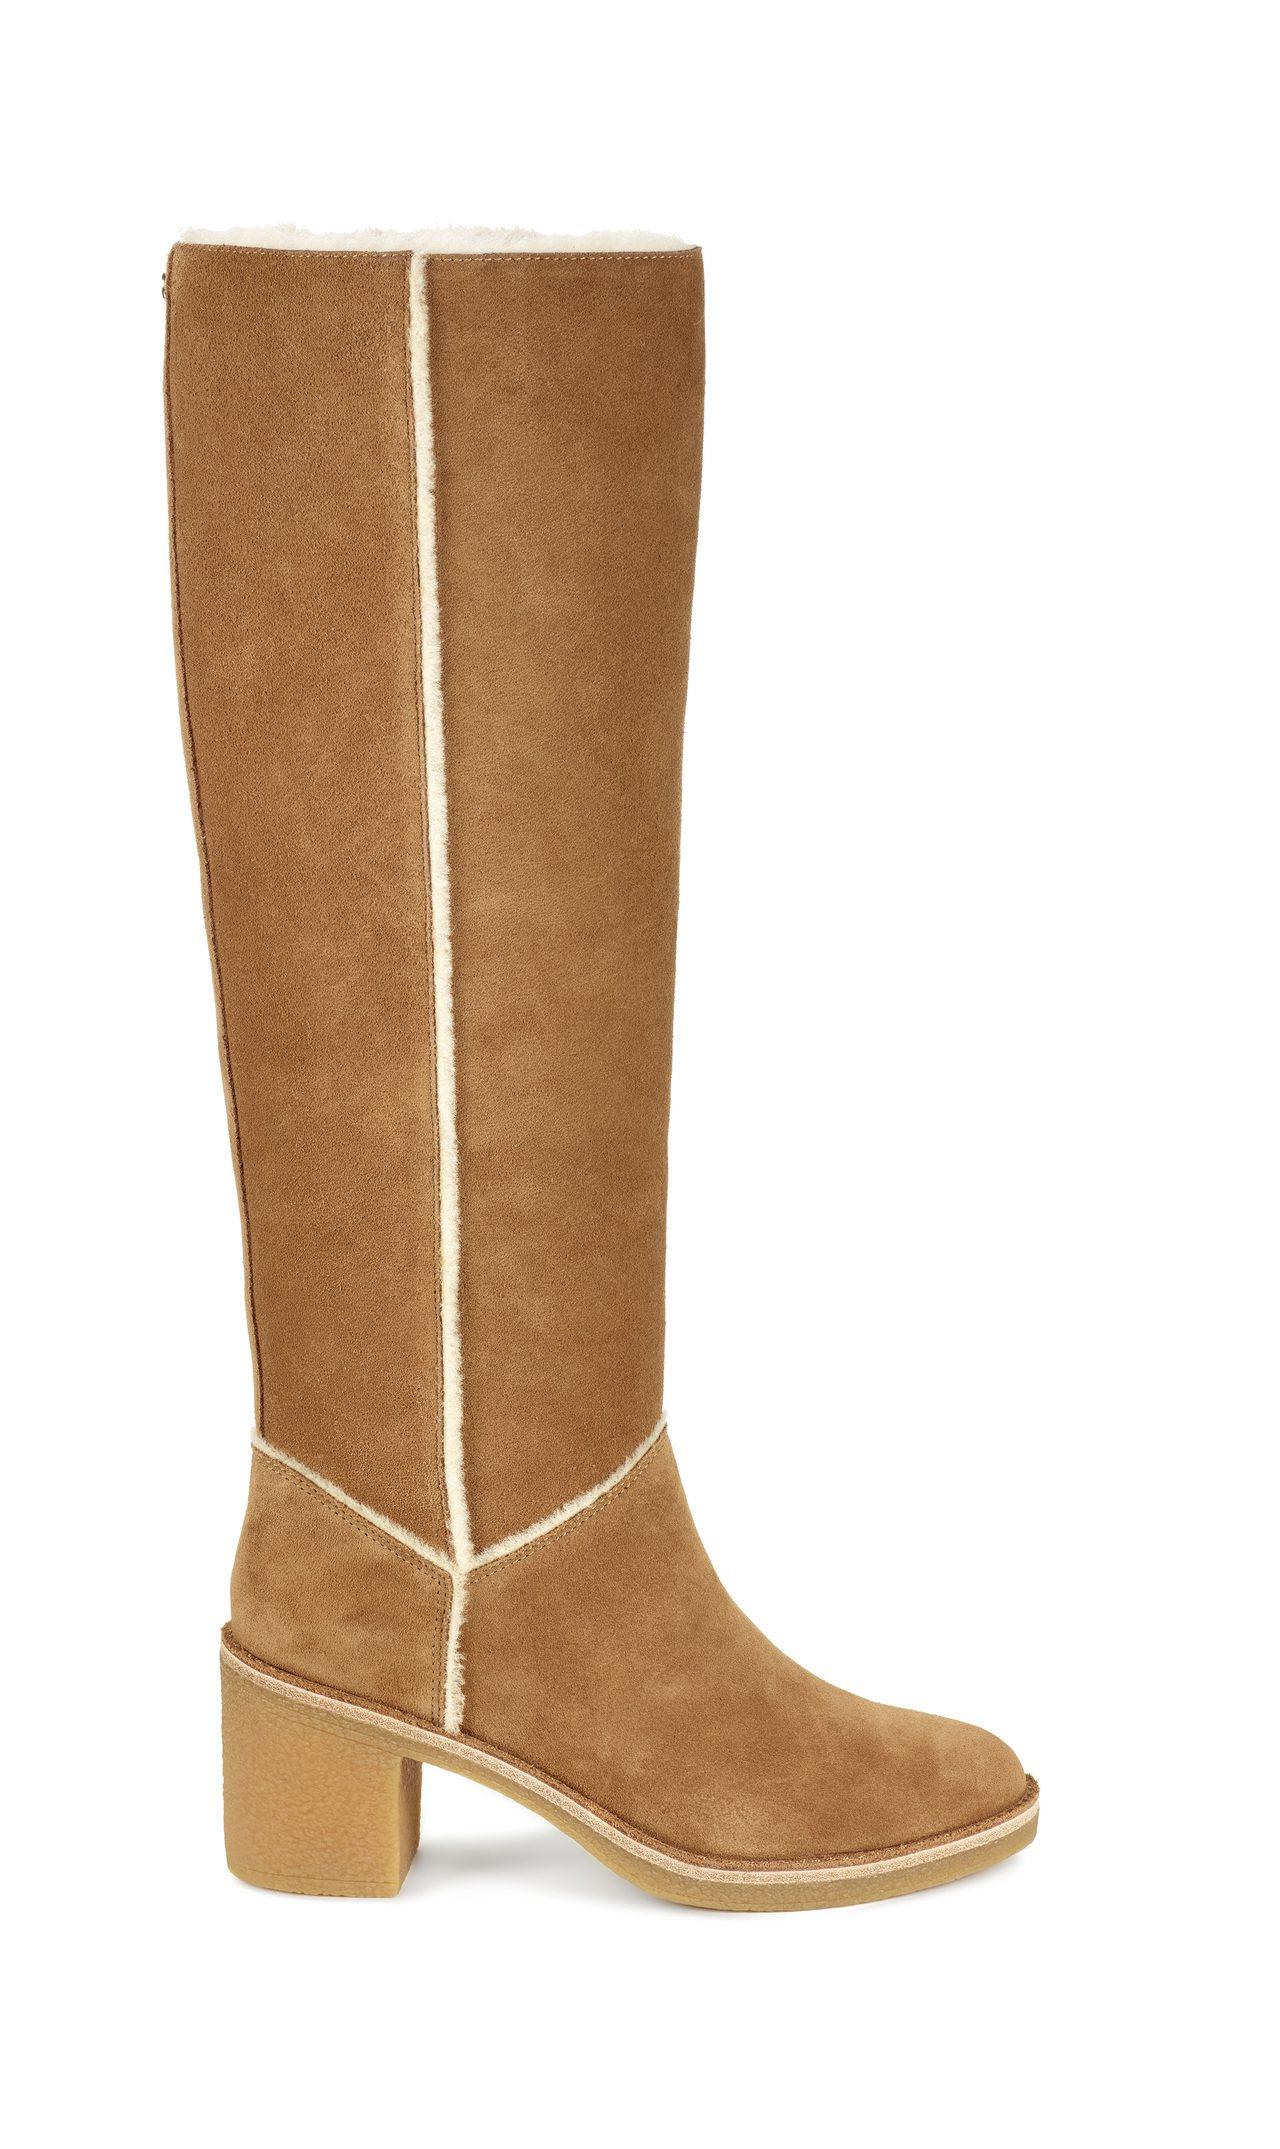 Kasen粗跟長靴,12,500元。圖/UGG提供